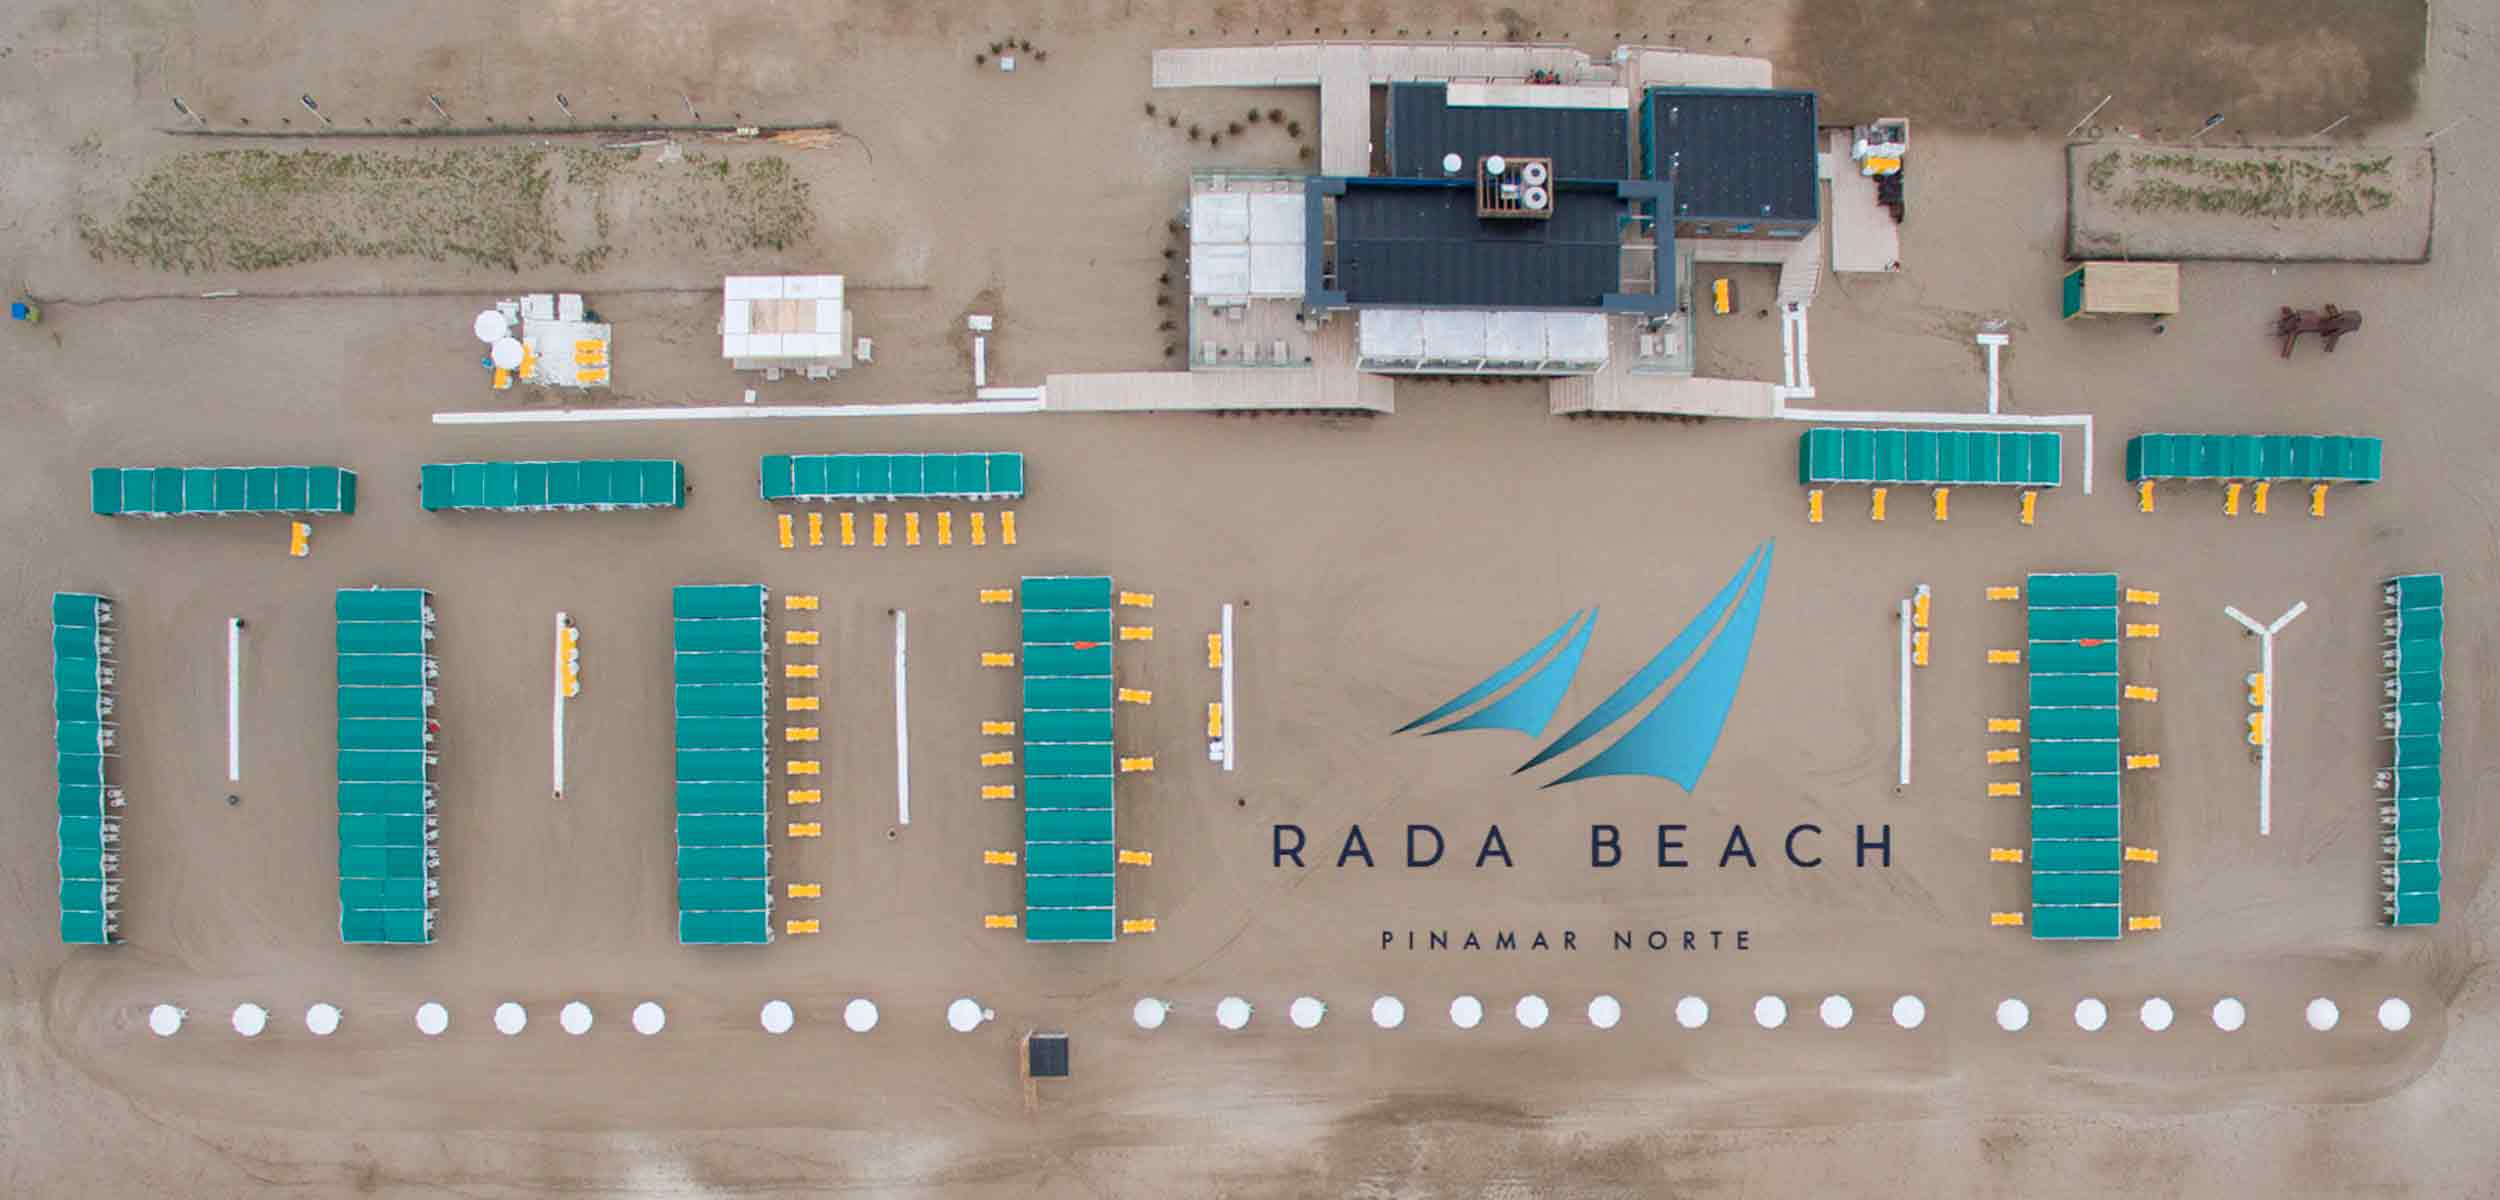 Rada Beach